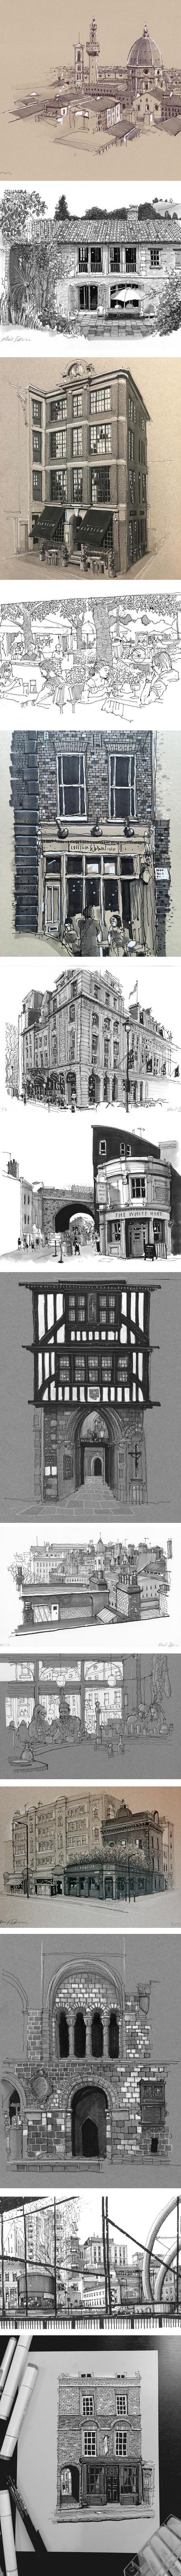 Phil Dean, urban sketching